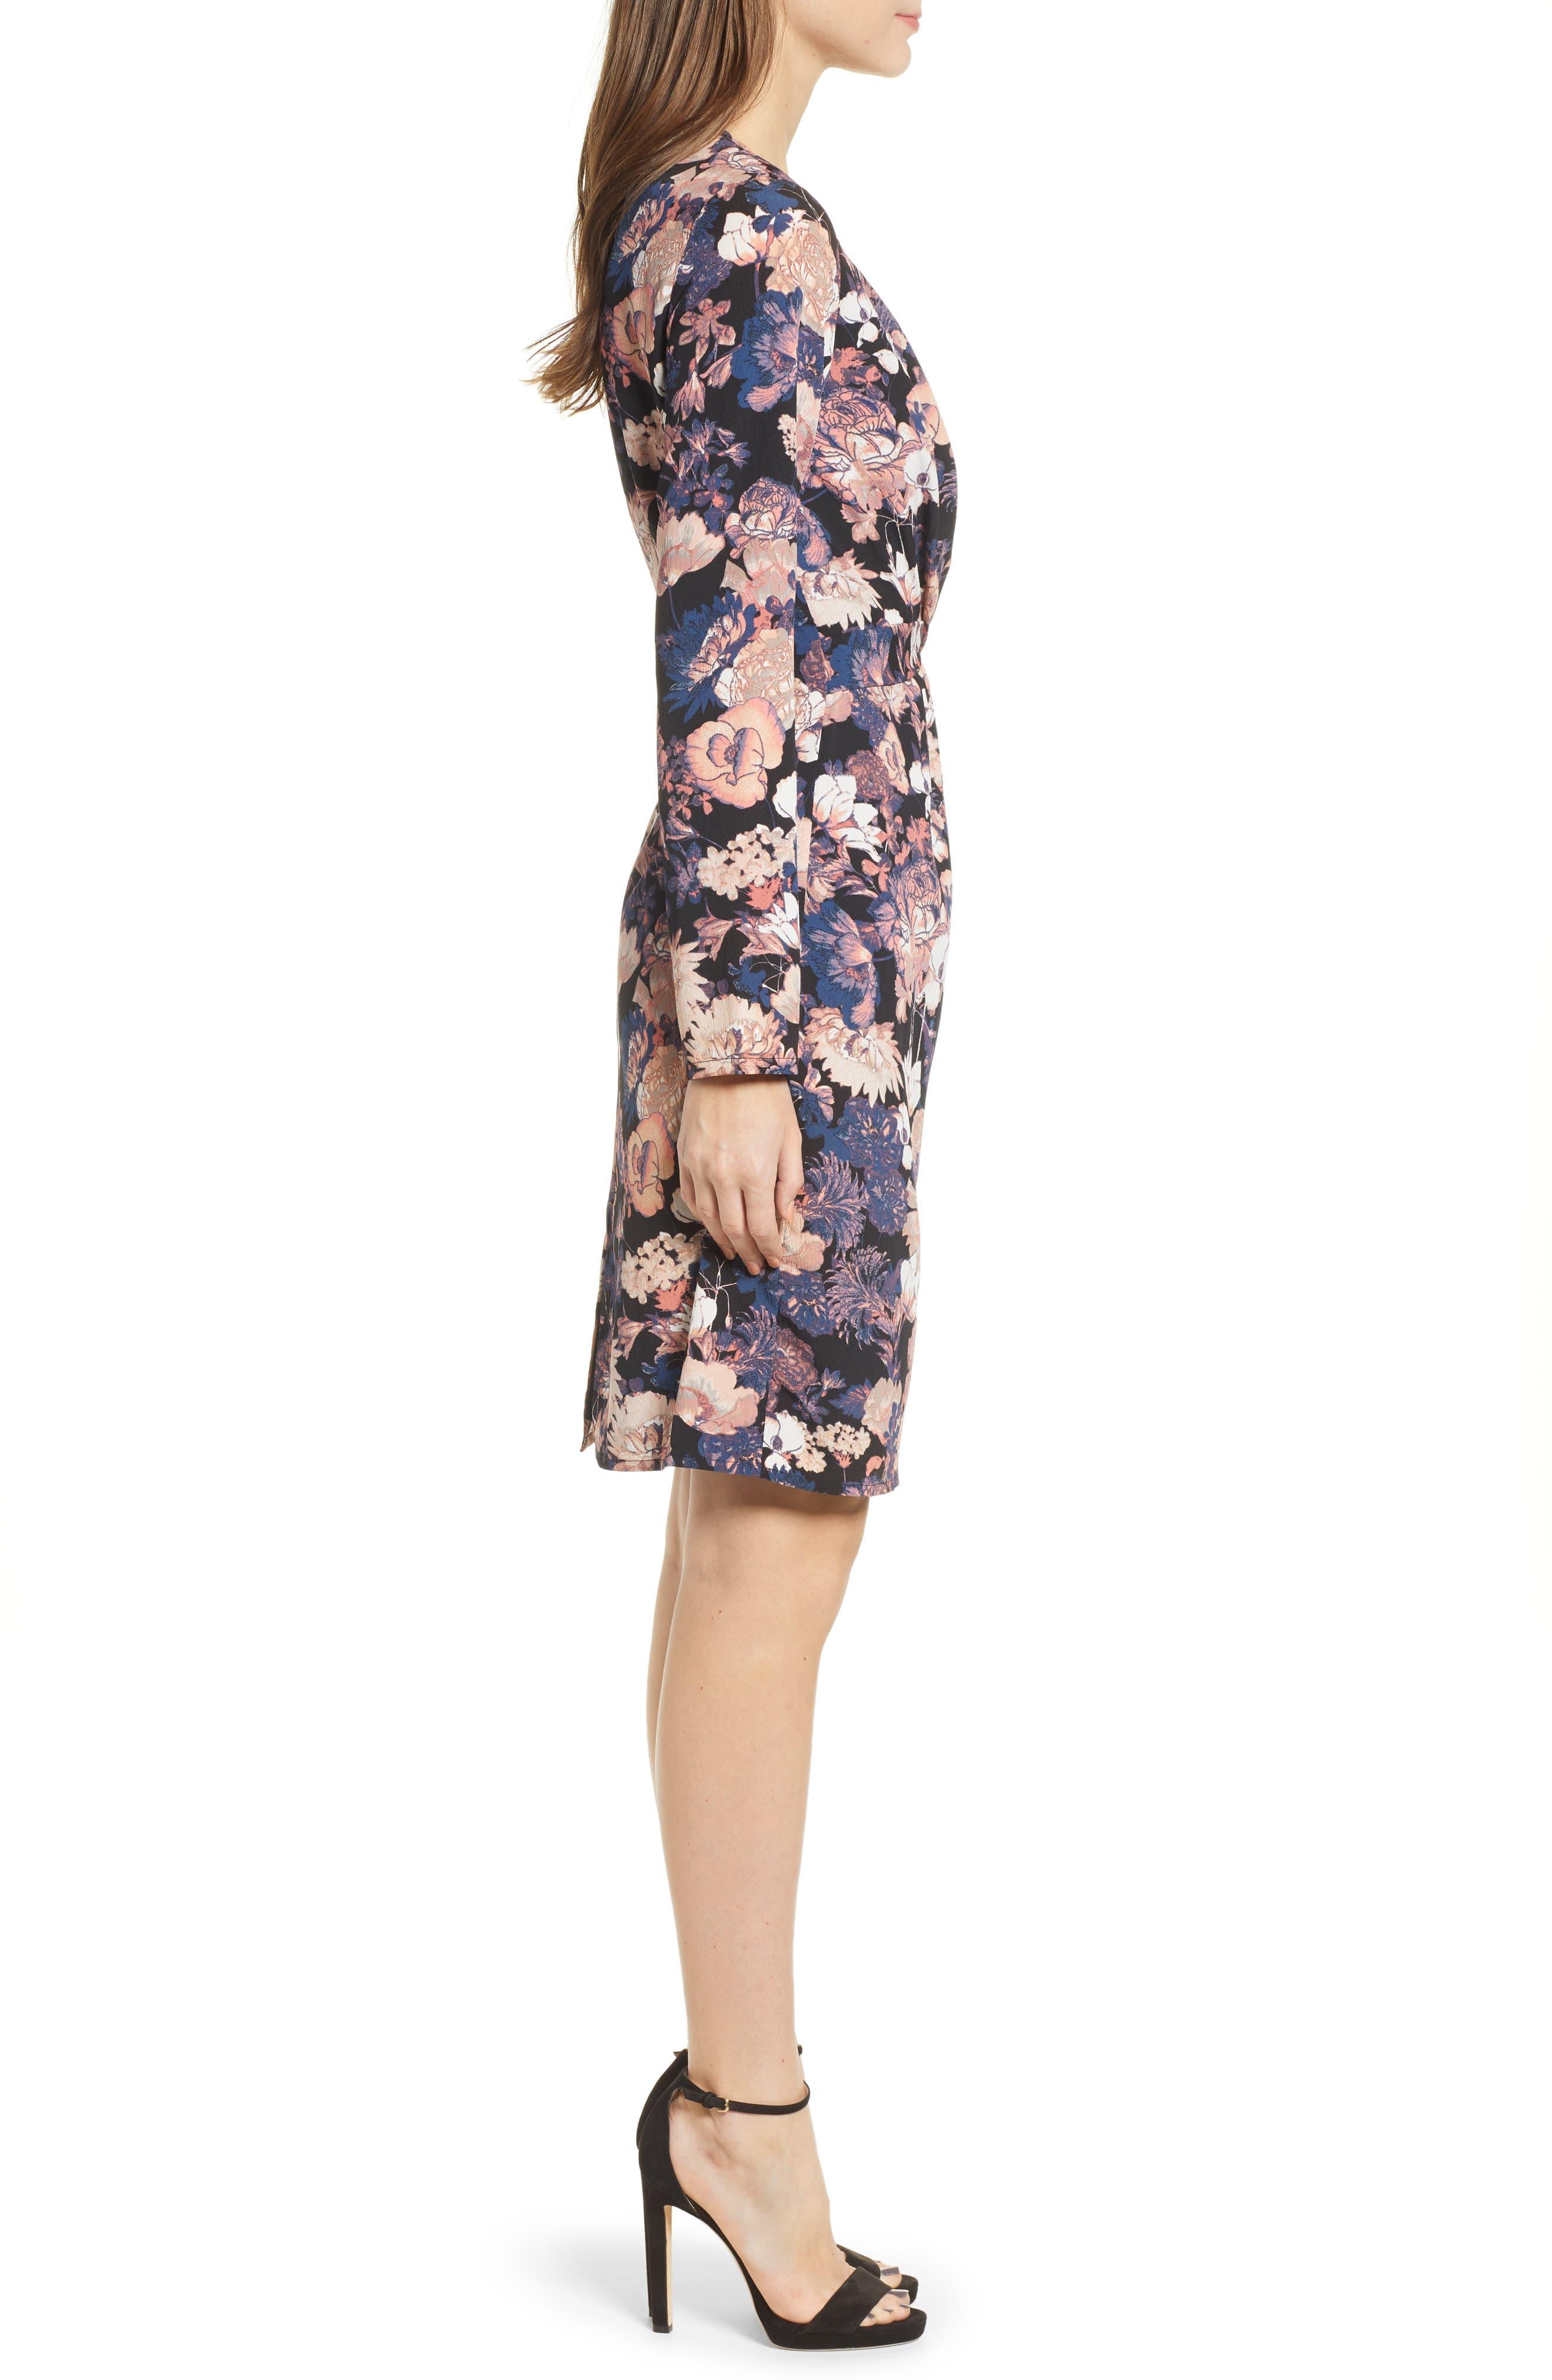 VERO MODA,                             Marlene Floral Drape Dress,                             Alternate thumbnail 4, color,                             BLACK PRINT